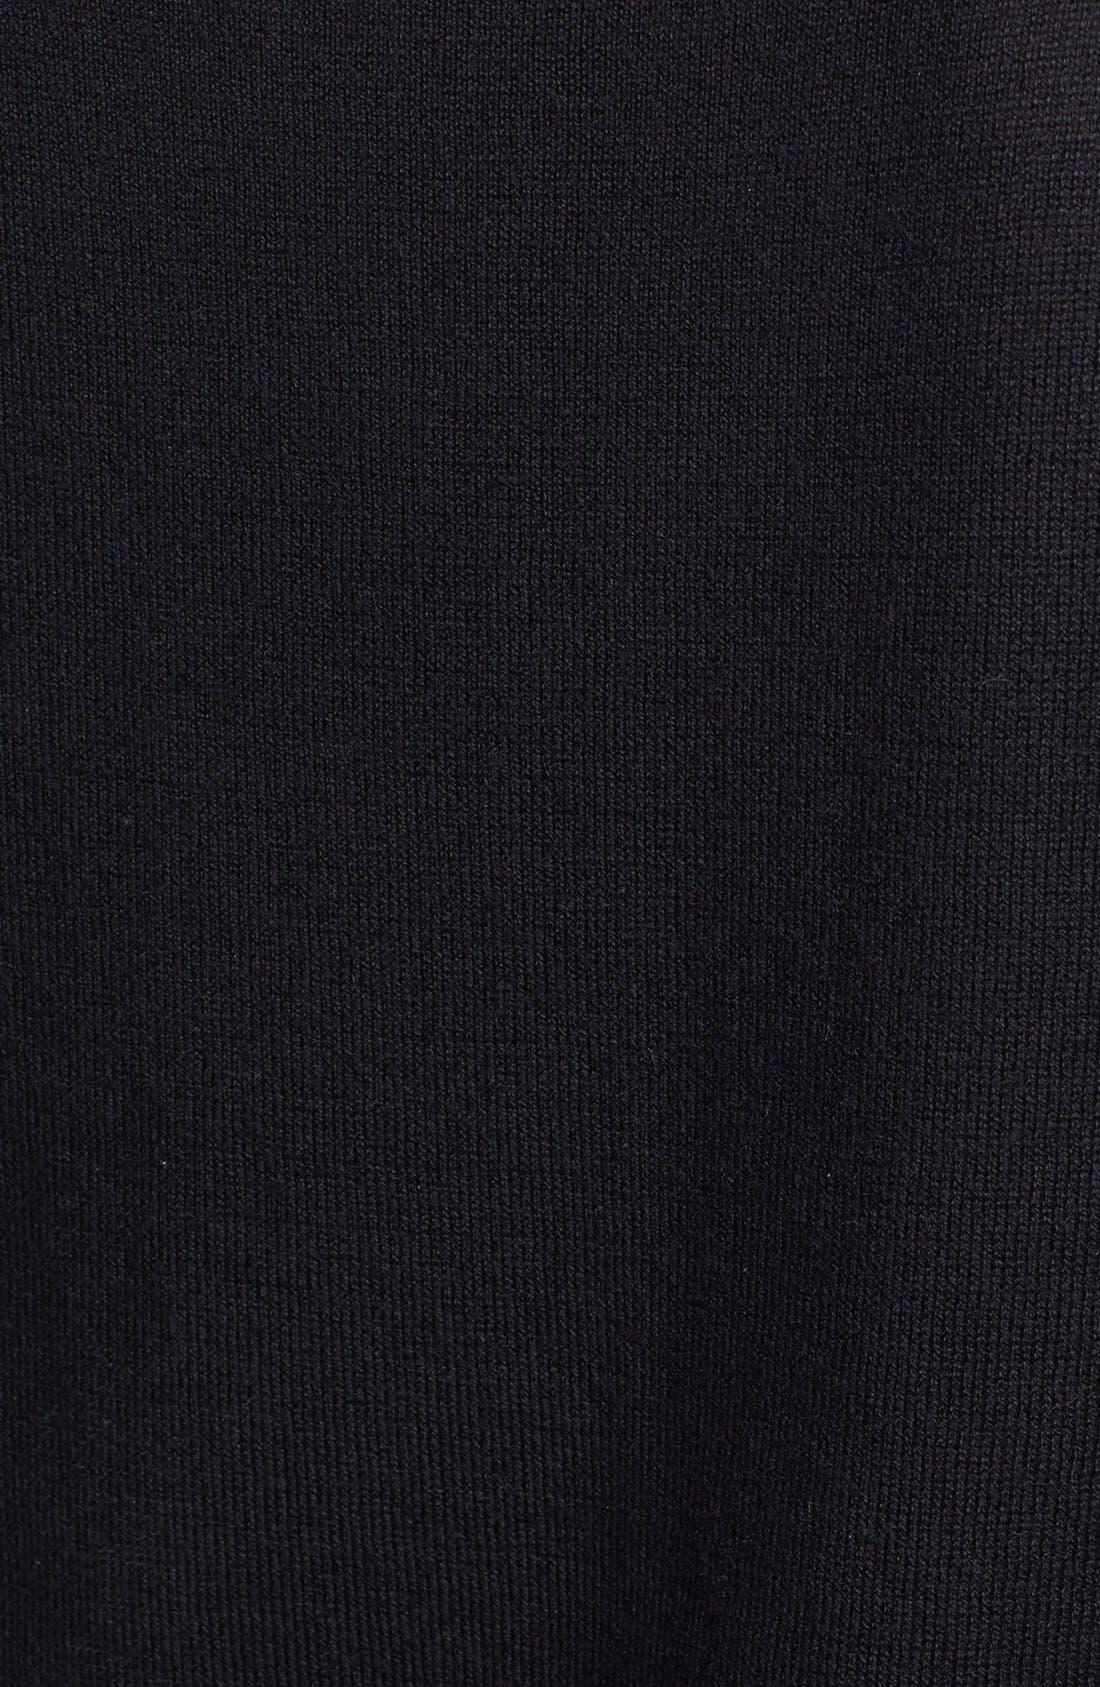 Alternate Image 3  - Vince Camuto Diamond Intarsia Crewneck Sweater